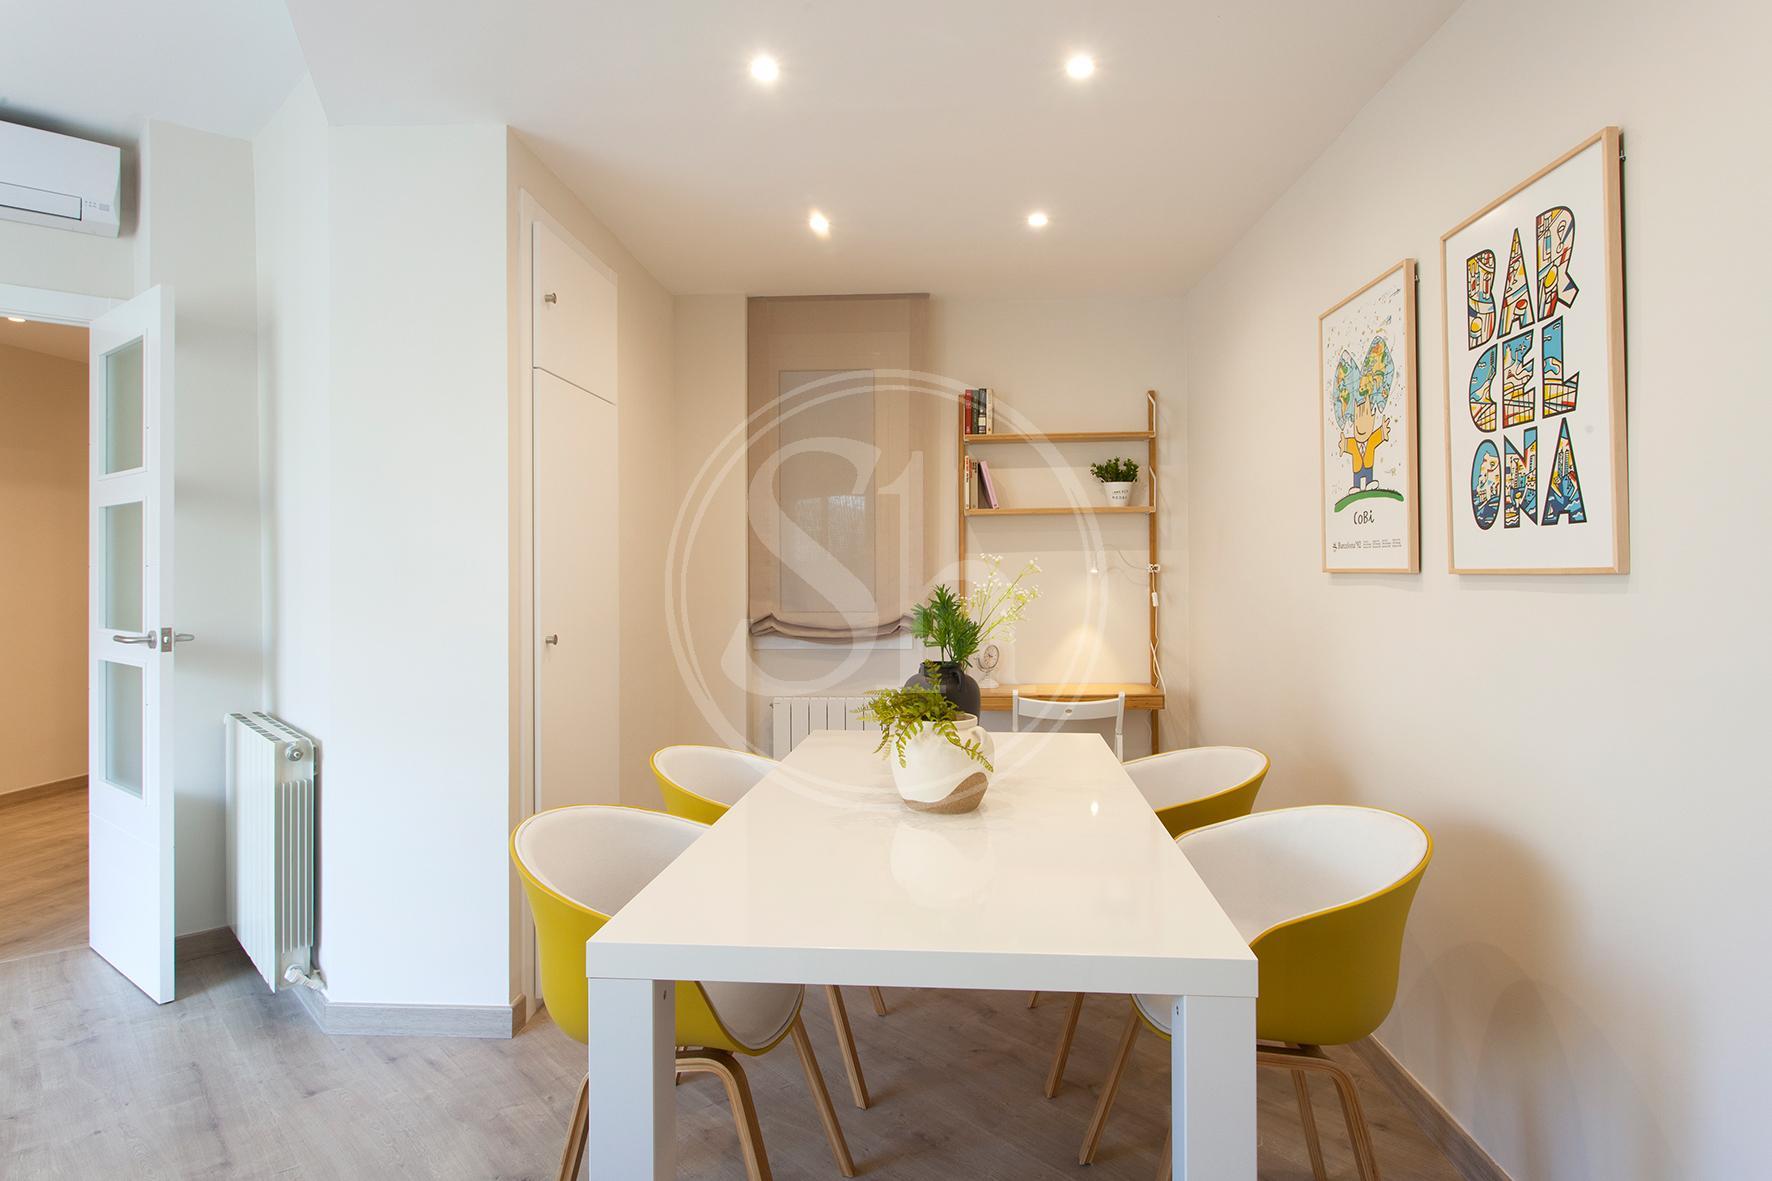 Shbarcelona hermoso piso de alquiler mensual en l 39 eixample - Piso alquiler sagrada familia ...